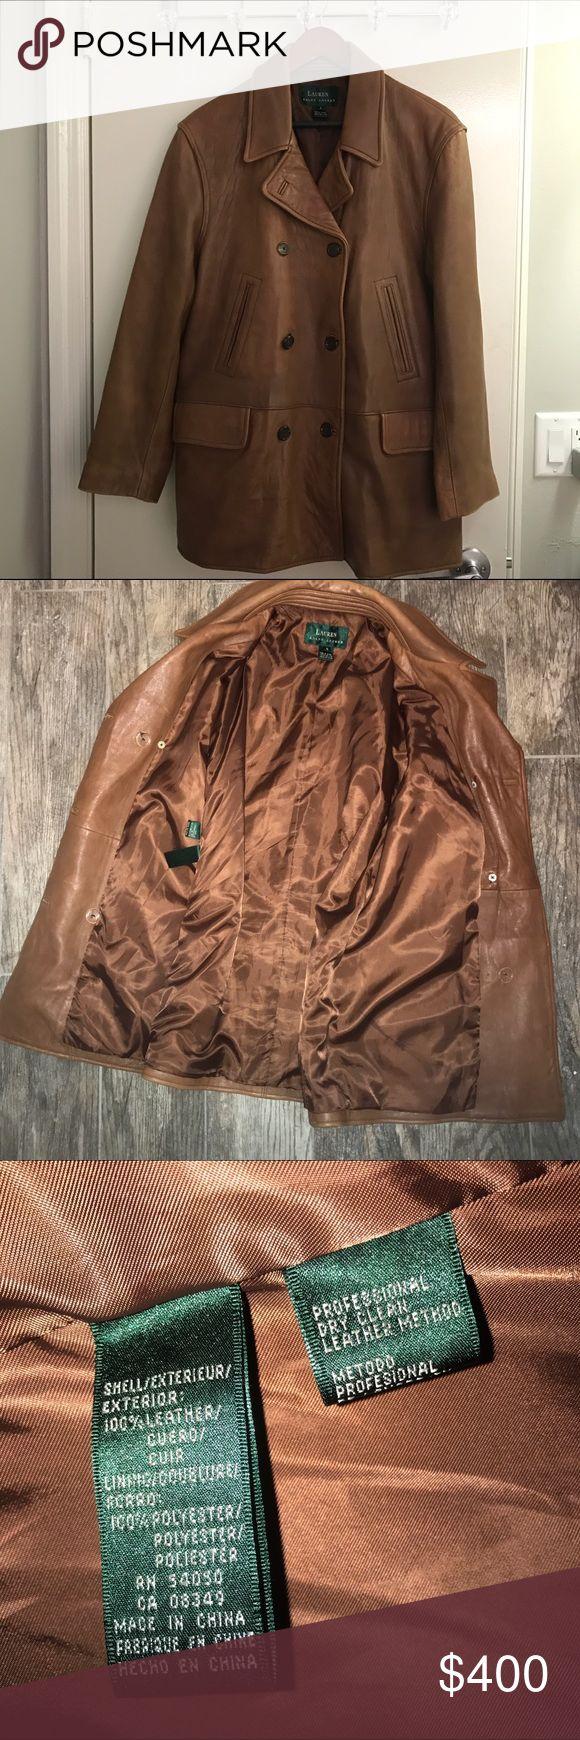 Beautiful designer leather jacket Ralph Lauren Ralph Lauren Luxury Tan Leather Jacket size 8 Exceptional quality and condition. Ralph Lauren Jackets & Coats